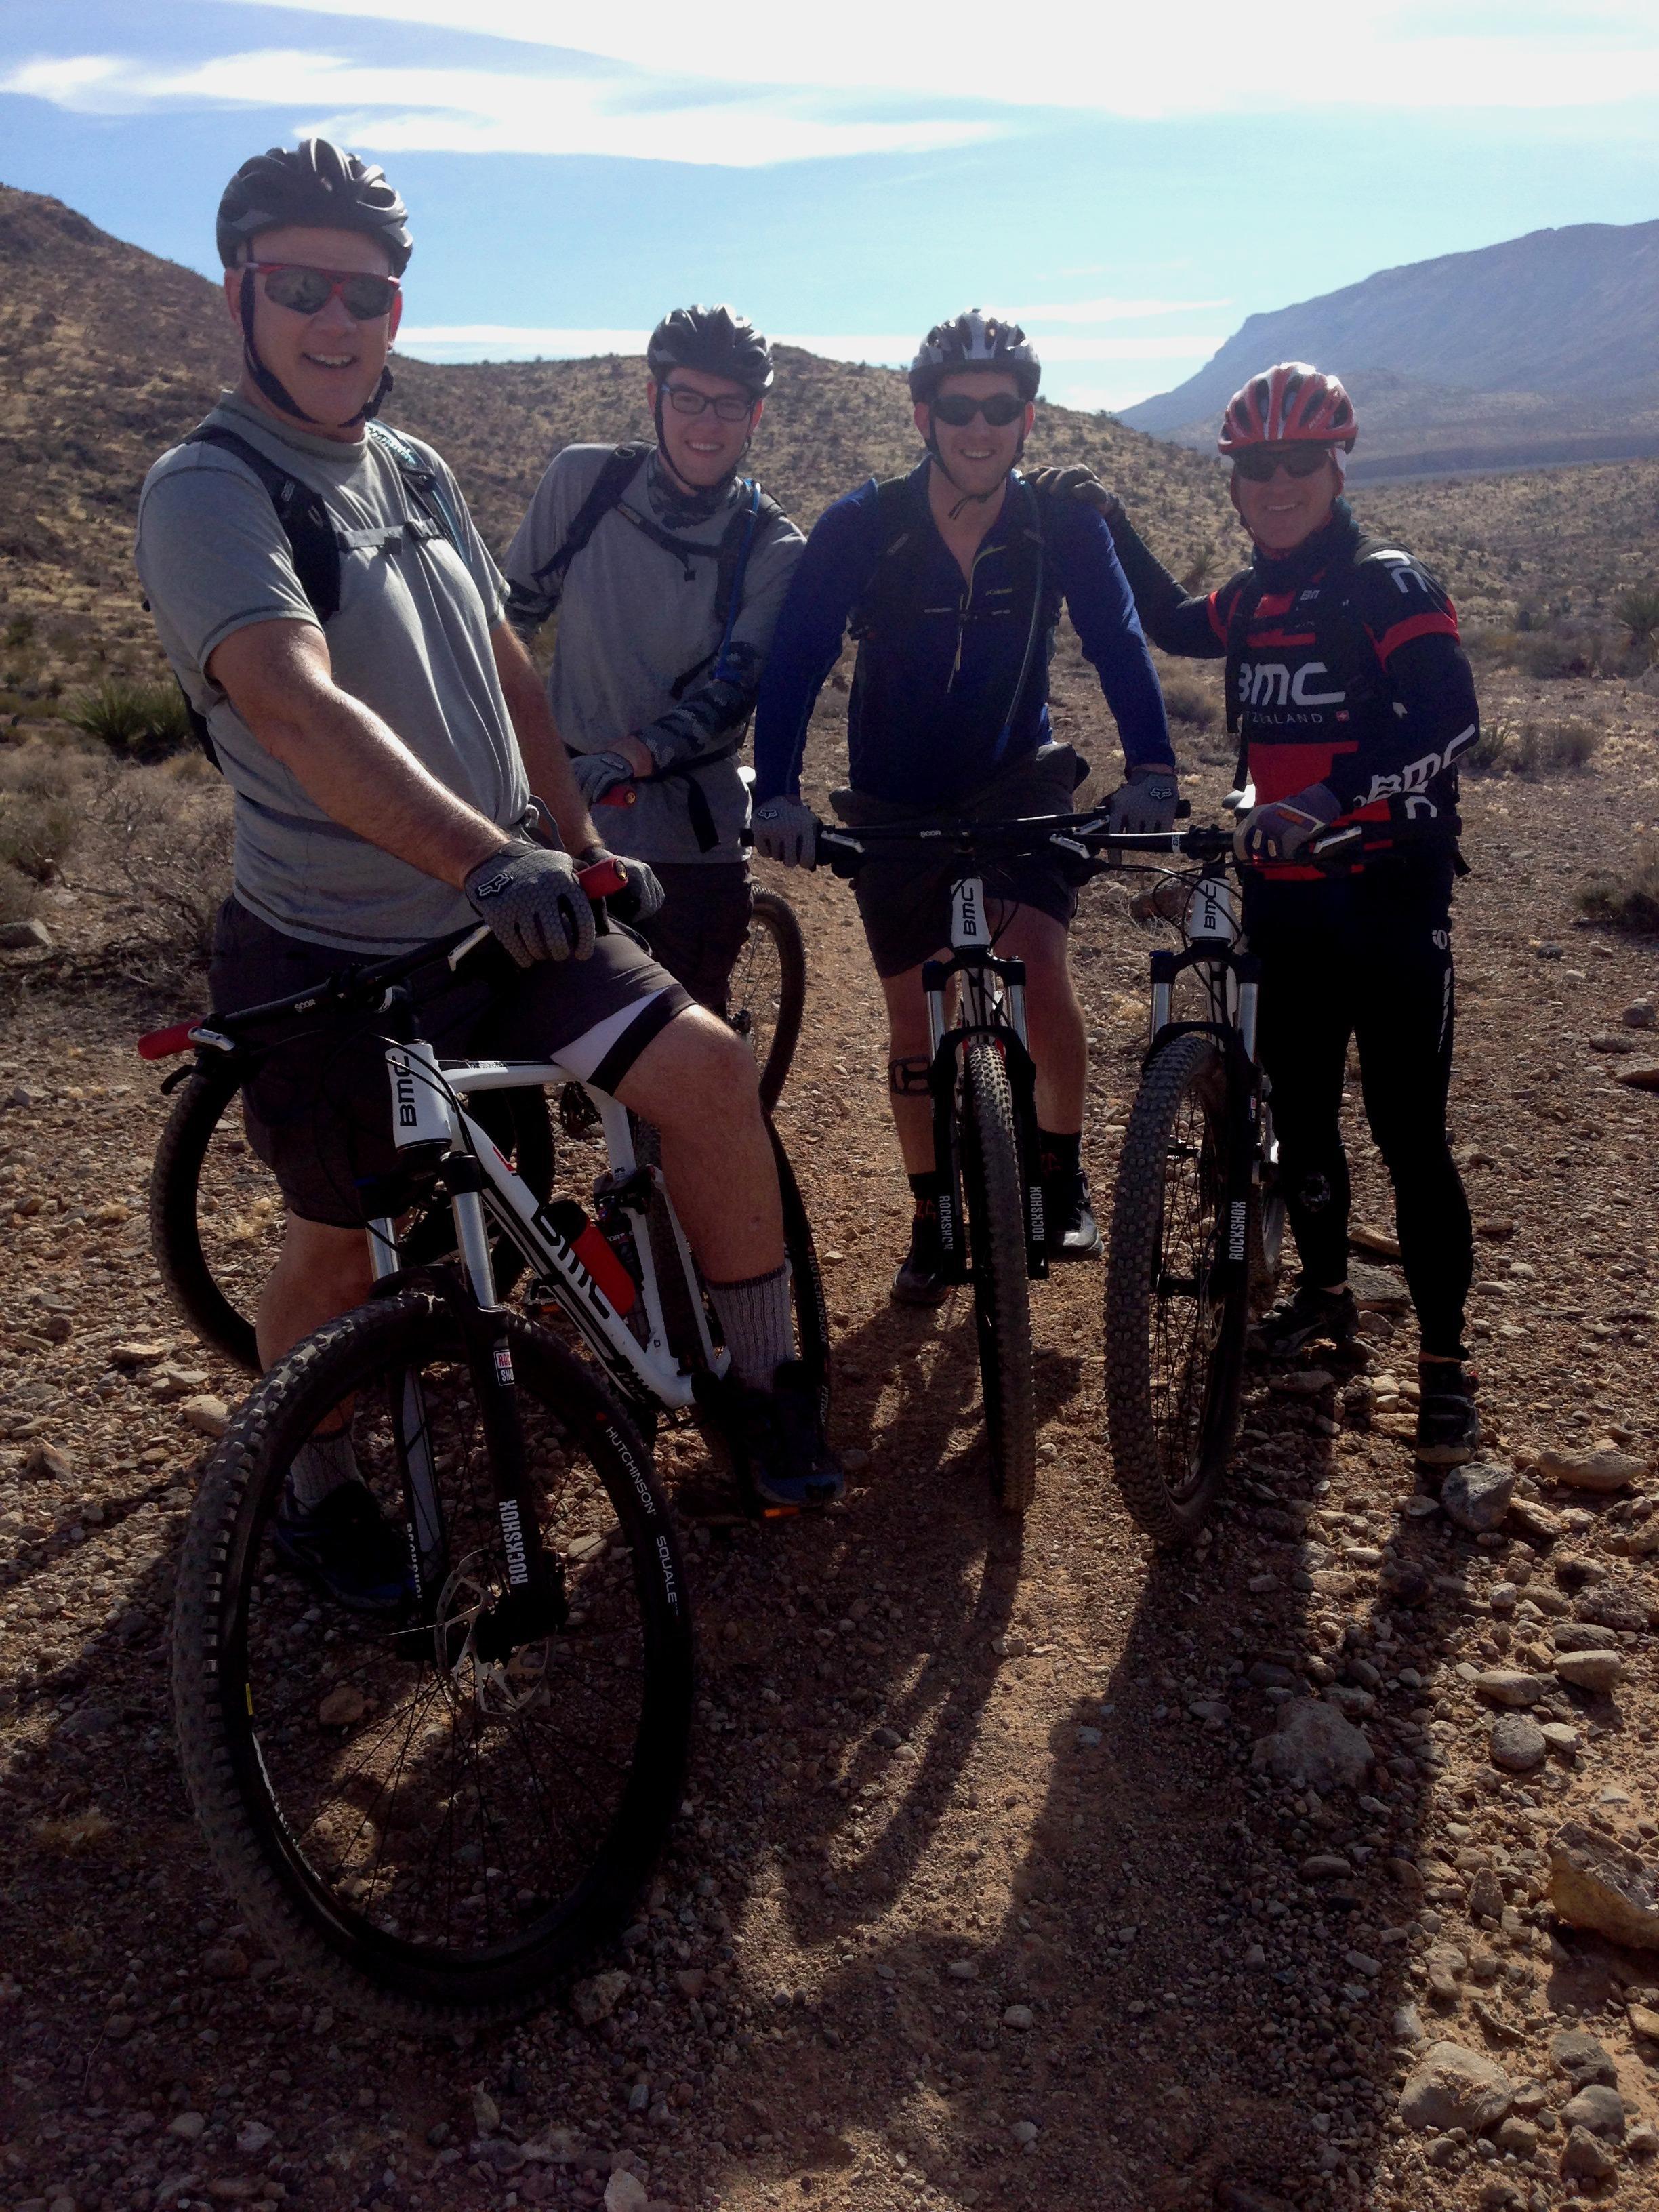 Bike Blast Las Vegas image 6